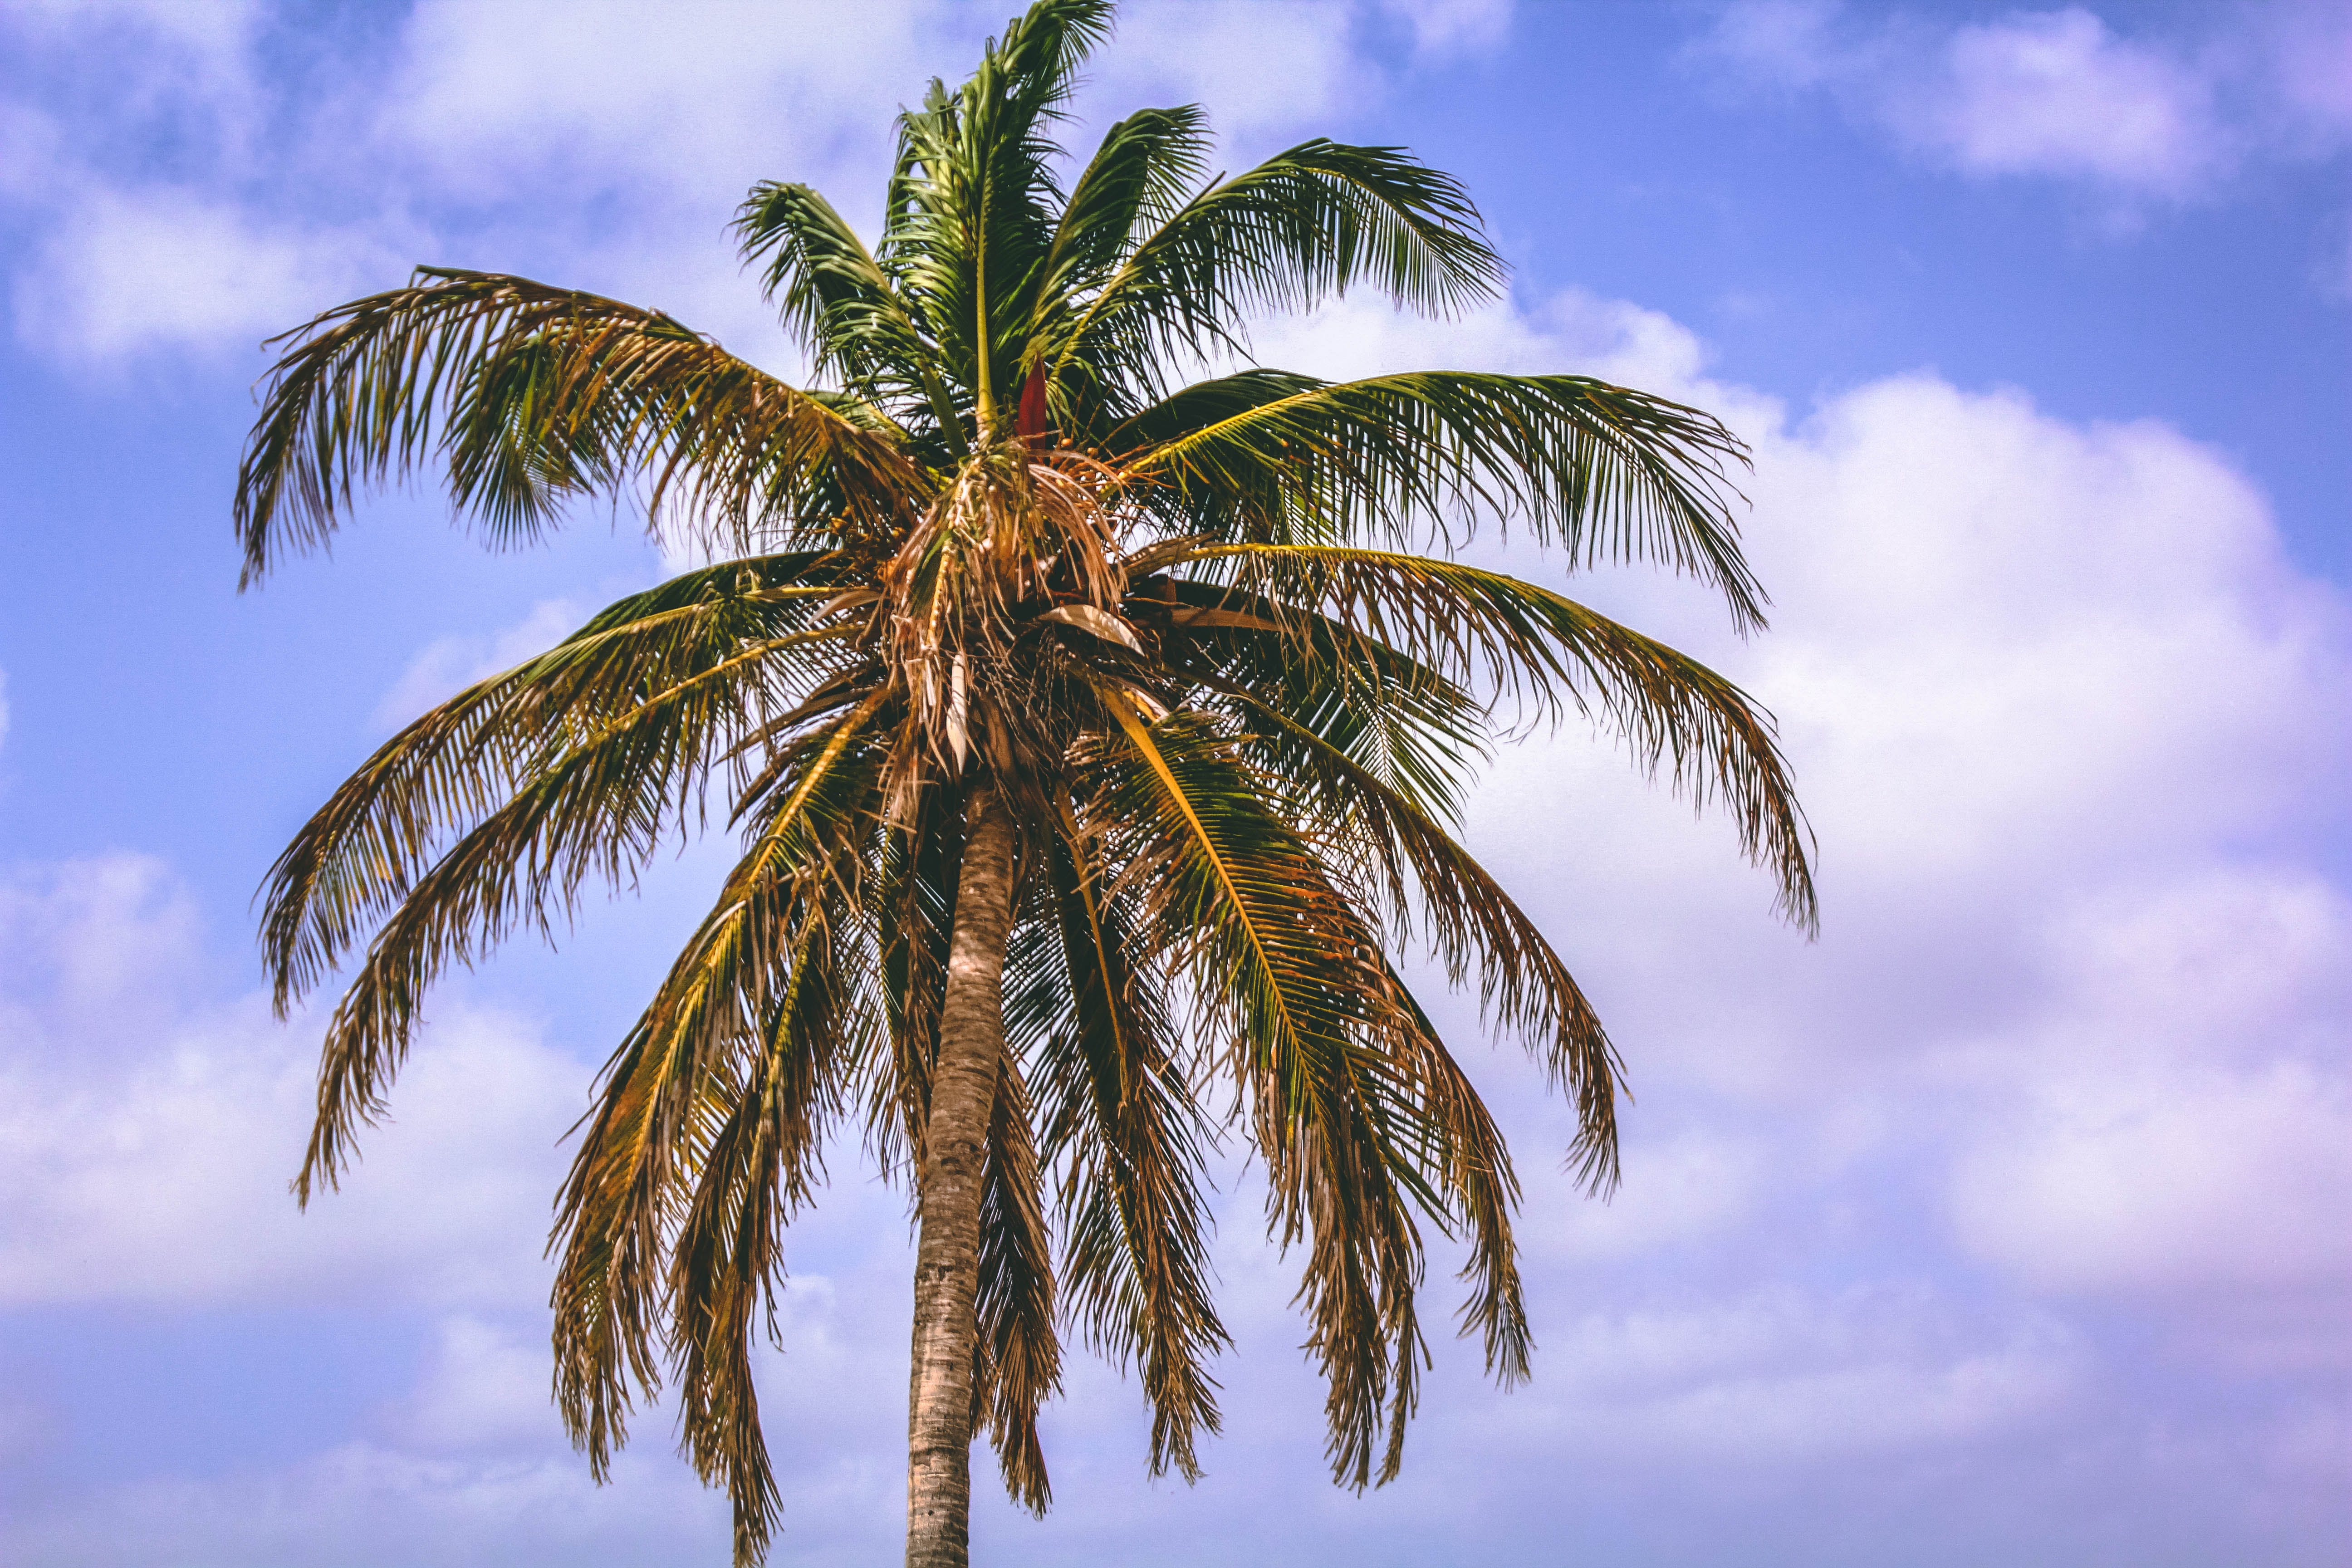 Gratis arkivbilde med eksotisk, himmel, idyllisk, kokosnøttre